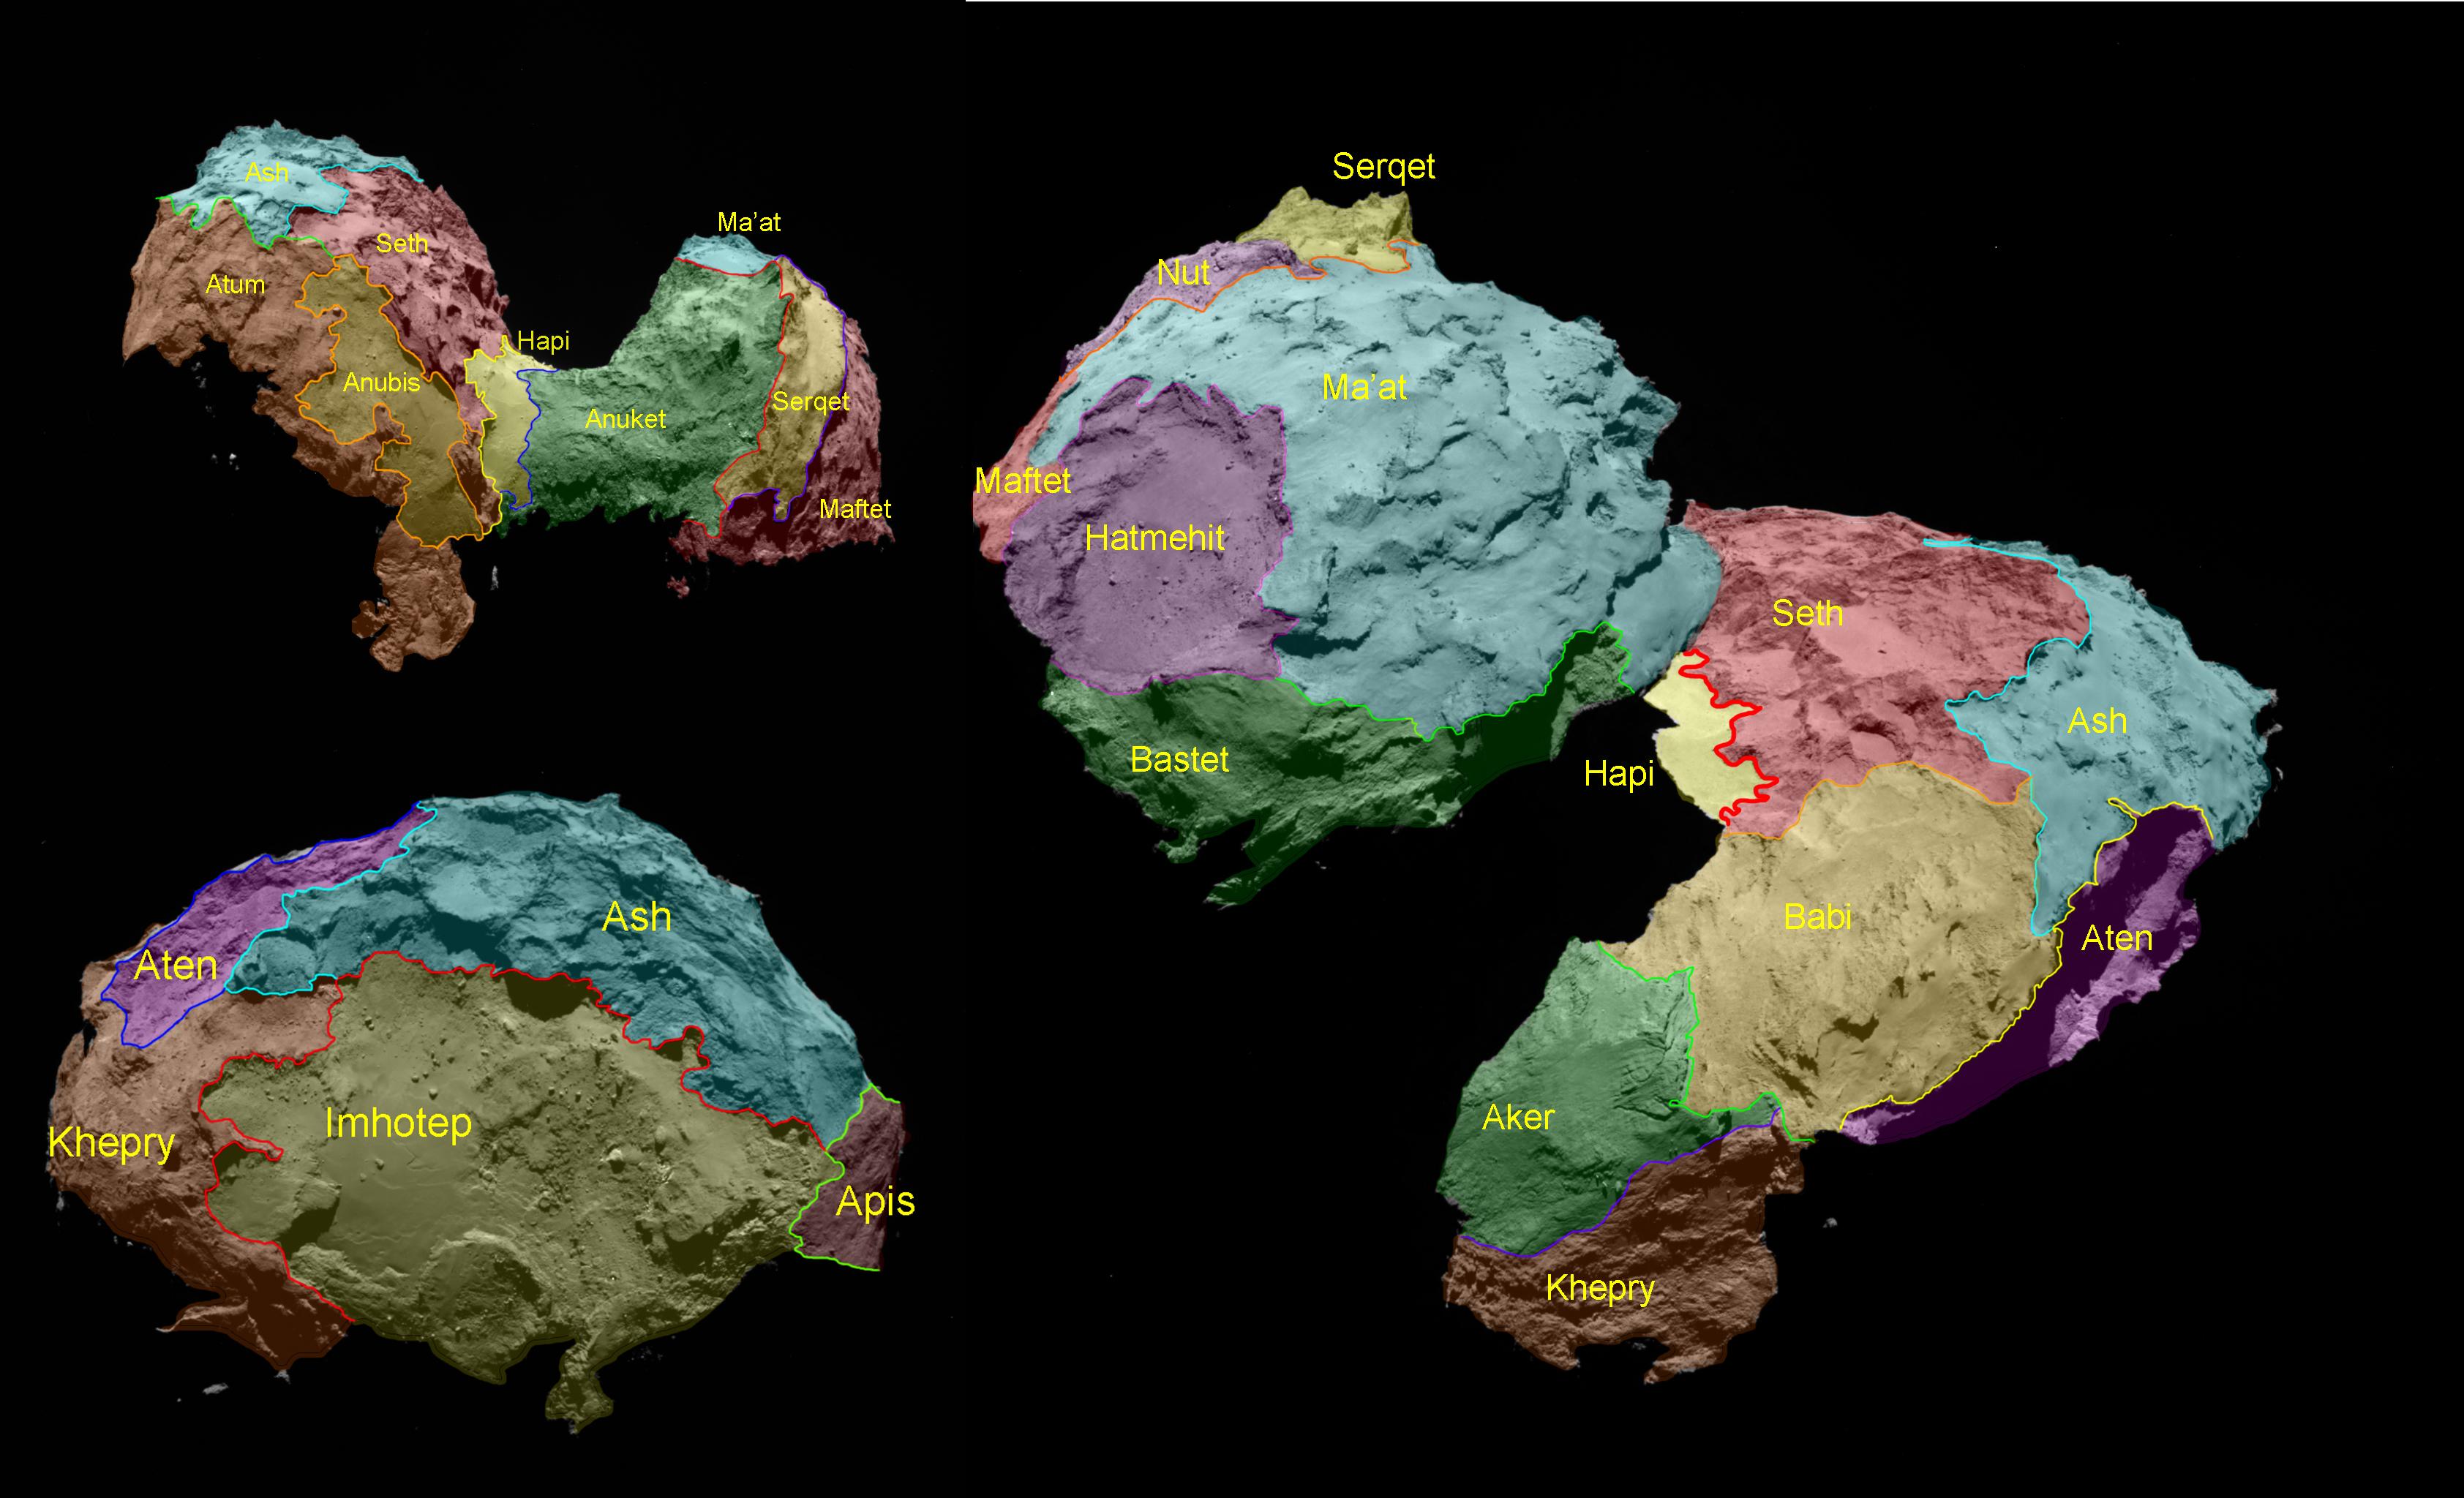 1567215781280-ESA_Rosetta_67P_OSIRIS_regional_maps.jpg